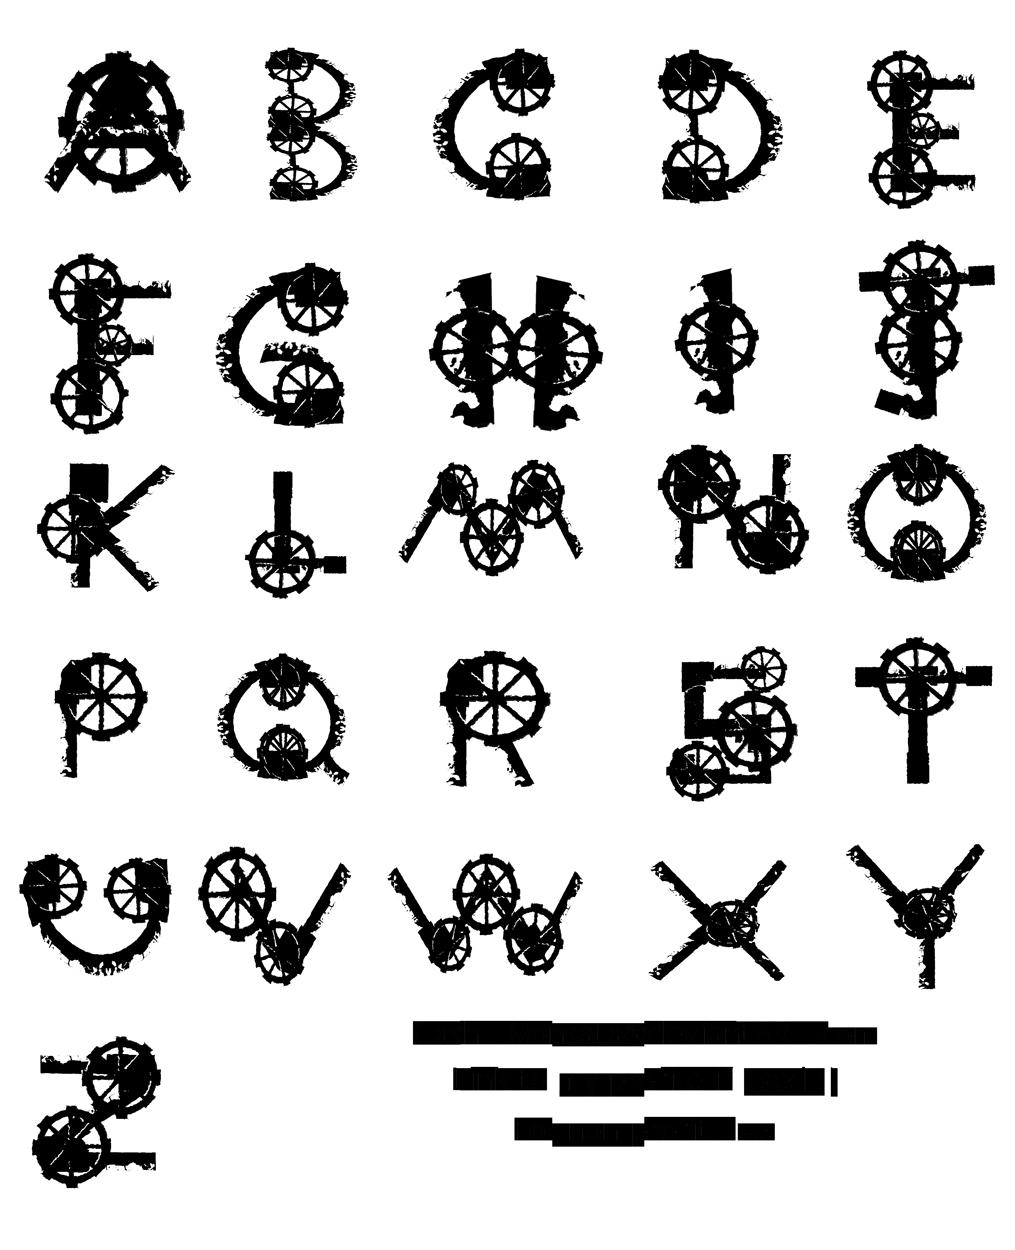 26 Steampunk Drawn Alphabet,Pen drawn font,Colorful letters,Geometric Letters,Hand drawn Alphabet,Digital Font,PNG Alphabet,painted font